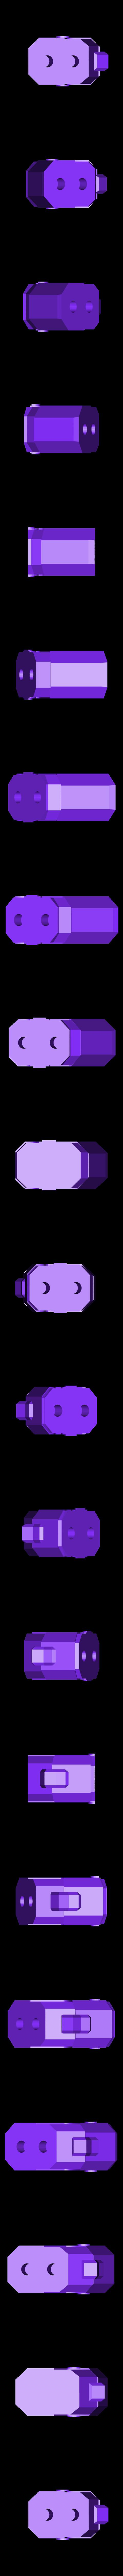 Handle-T.stl Download free STL file Full Sized Halo Plasma Pistol • 3D printer template, ChaosCoreTech